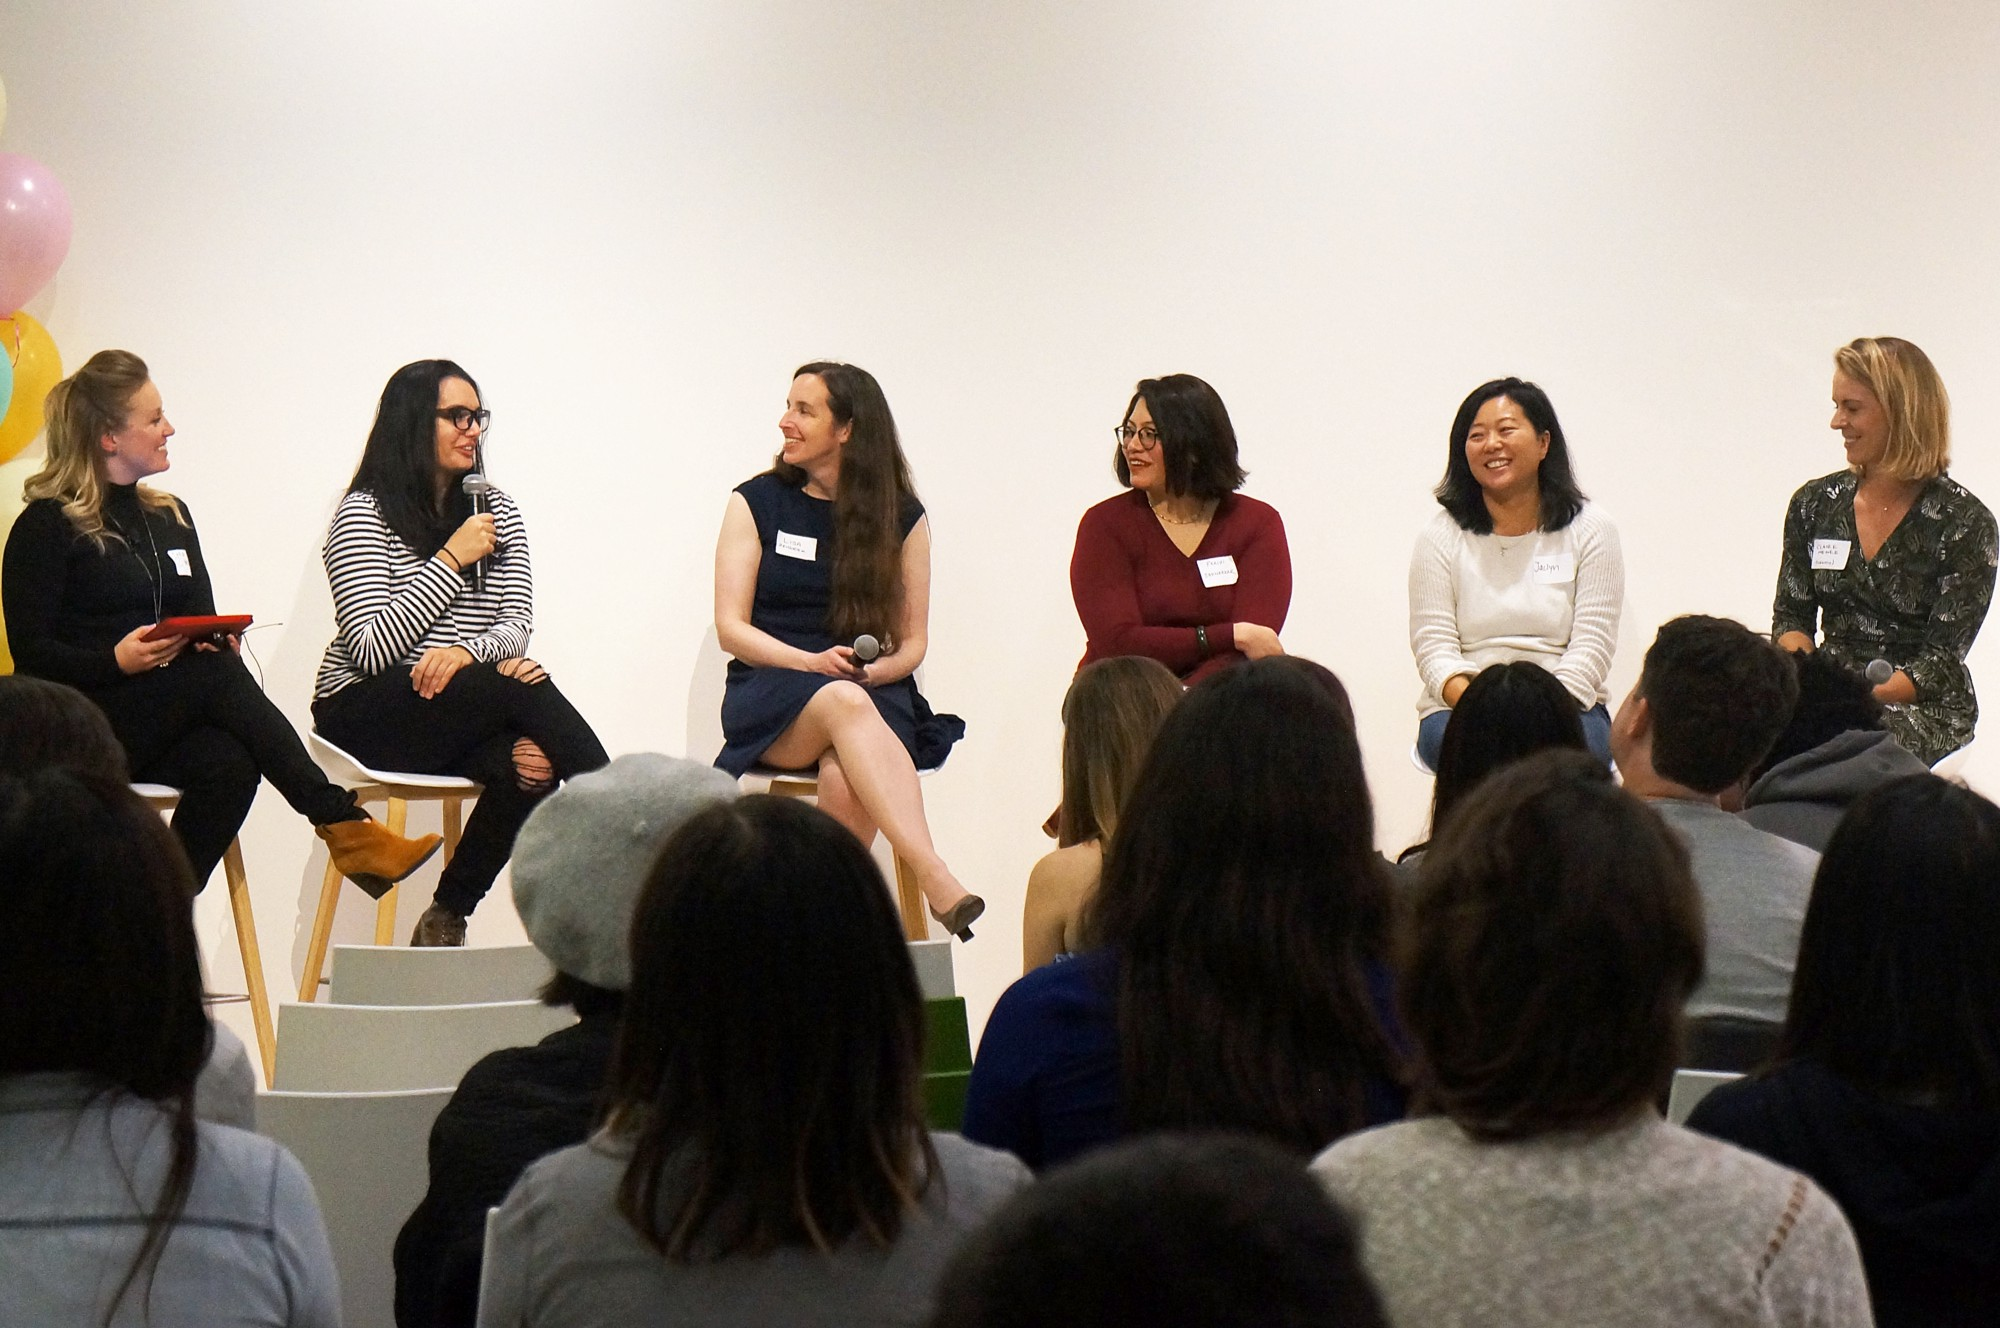 L to R: Cheriana Griggs (Moderator), Marissa Chacko , Lisa Friedman , Prachi Sakharkar , Jaclyn Zhuang , Claire Menke